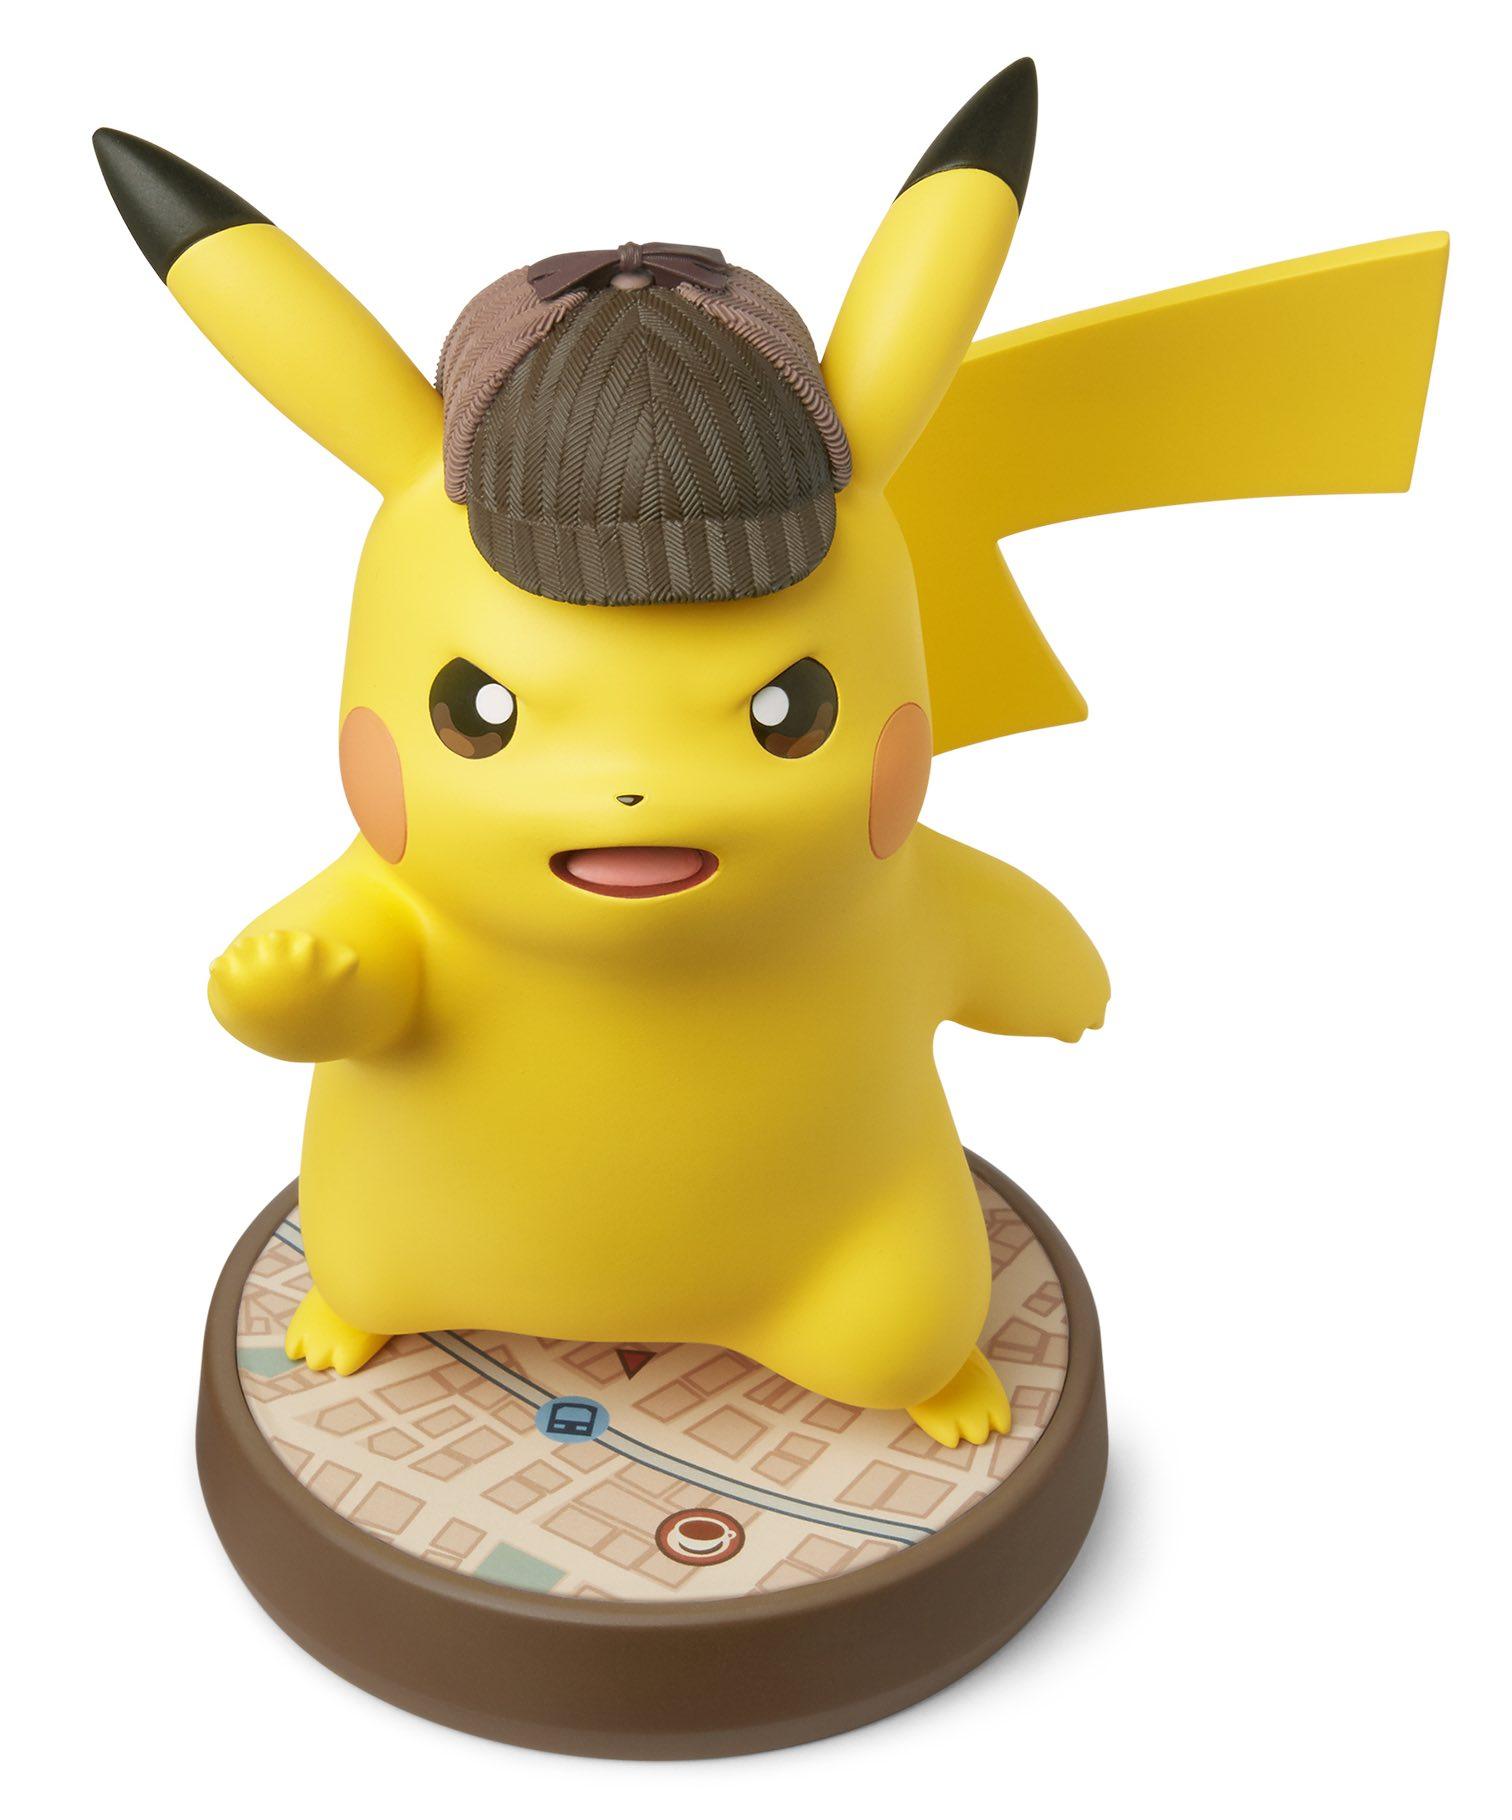 detective-pikachu-amiibo-figure